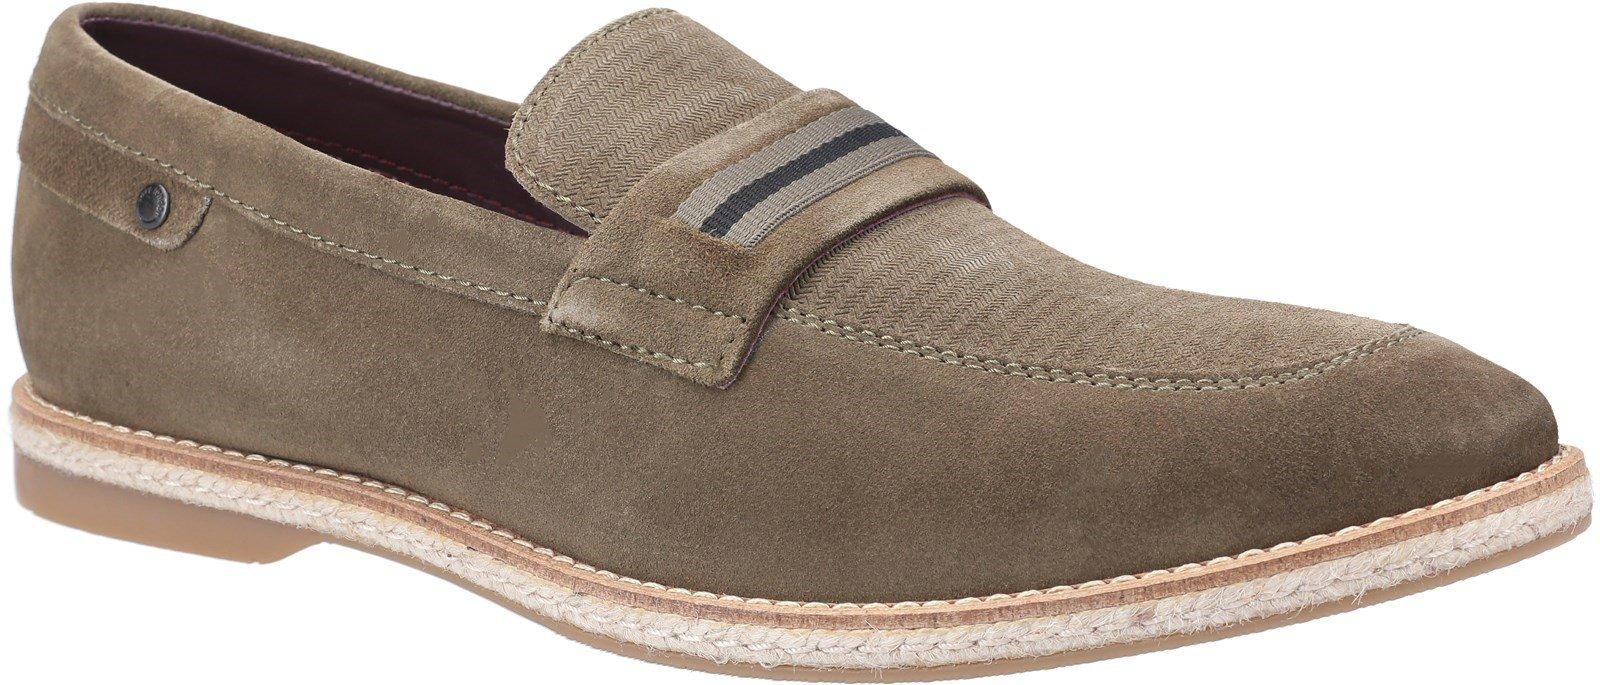 Base London Men's Kinsey Suede Slip On Loafer Various Colours 30444 - Khaki 9